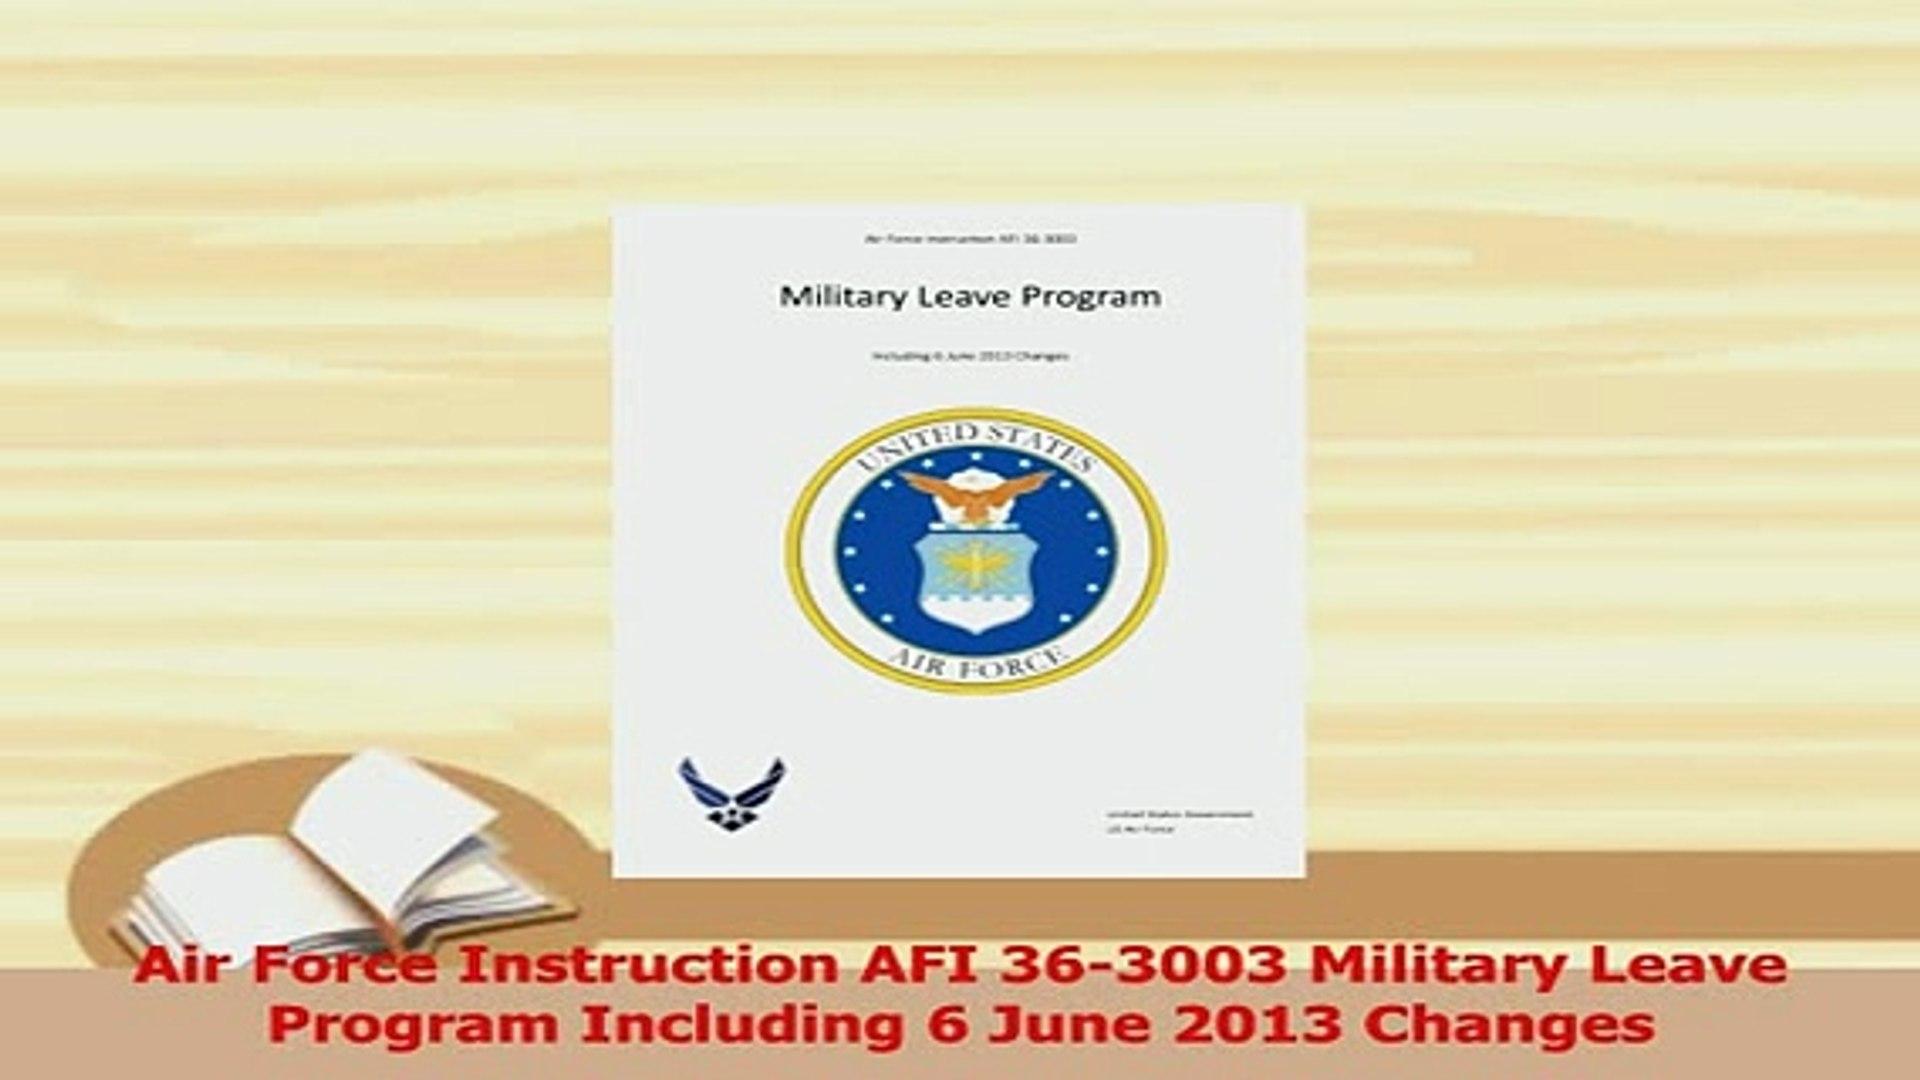 Air Force Instruction AFI 36-3003 Military Leave Program Including 6 June 2013 Changes